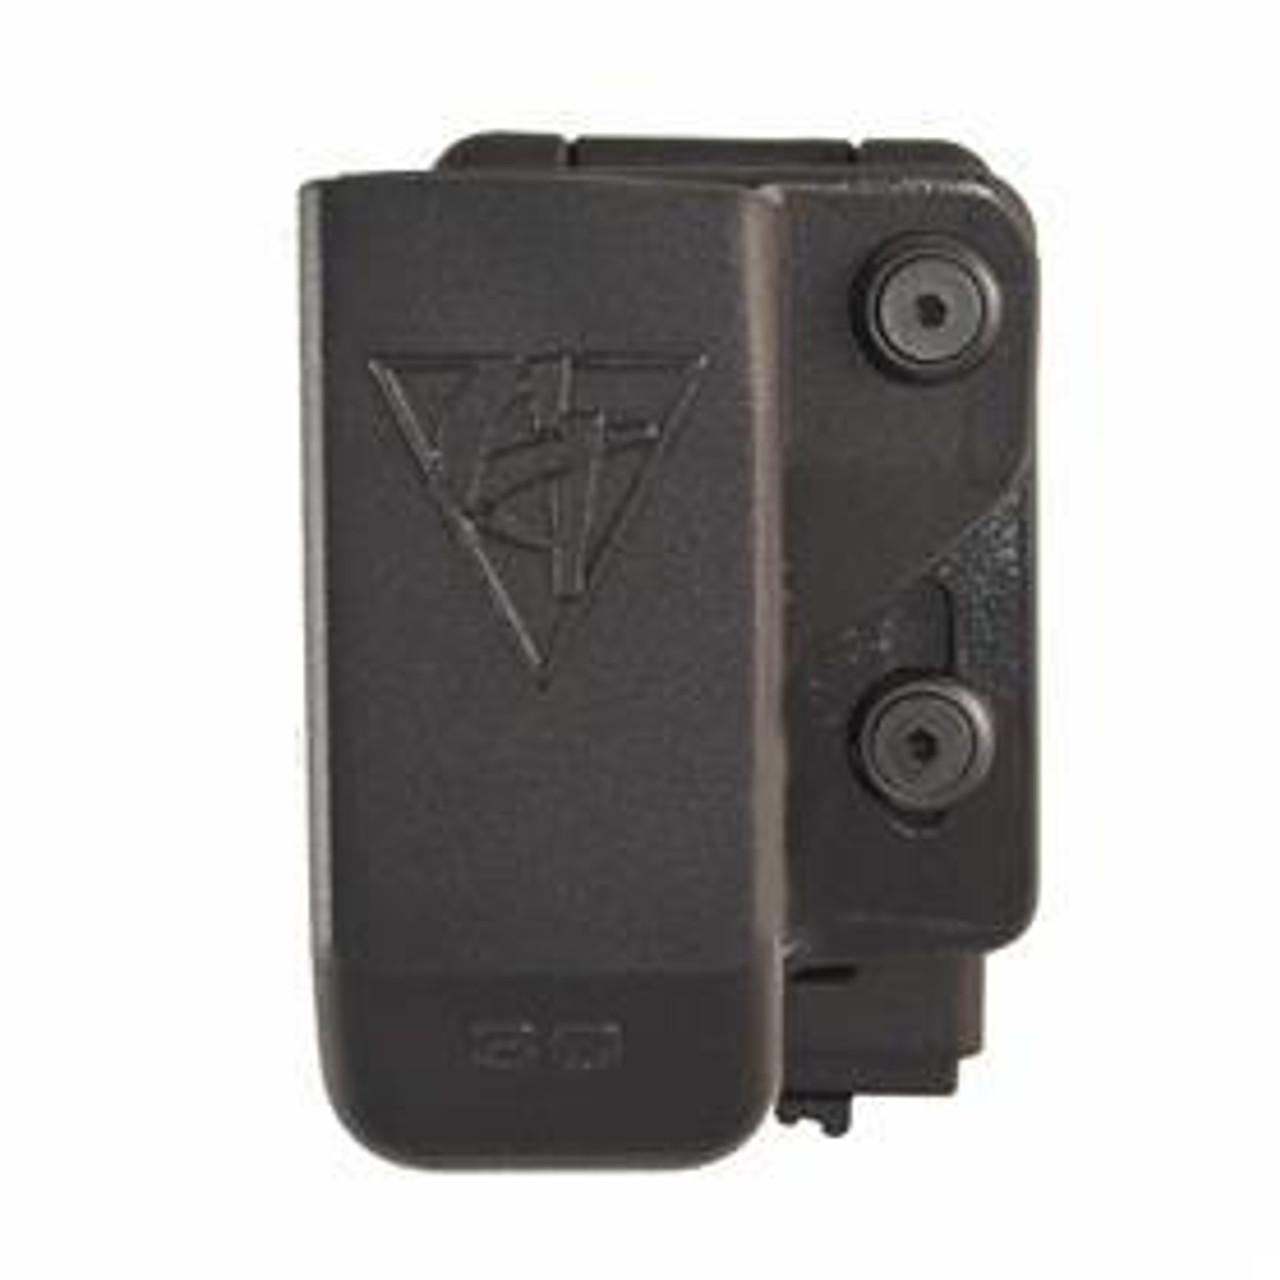 PCC PLM Magazine Pouch   Pistol Caliber Carbine   Push Button Locking Mount   OWB Kydex